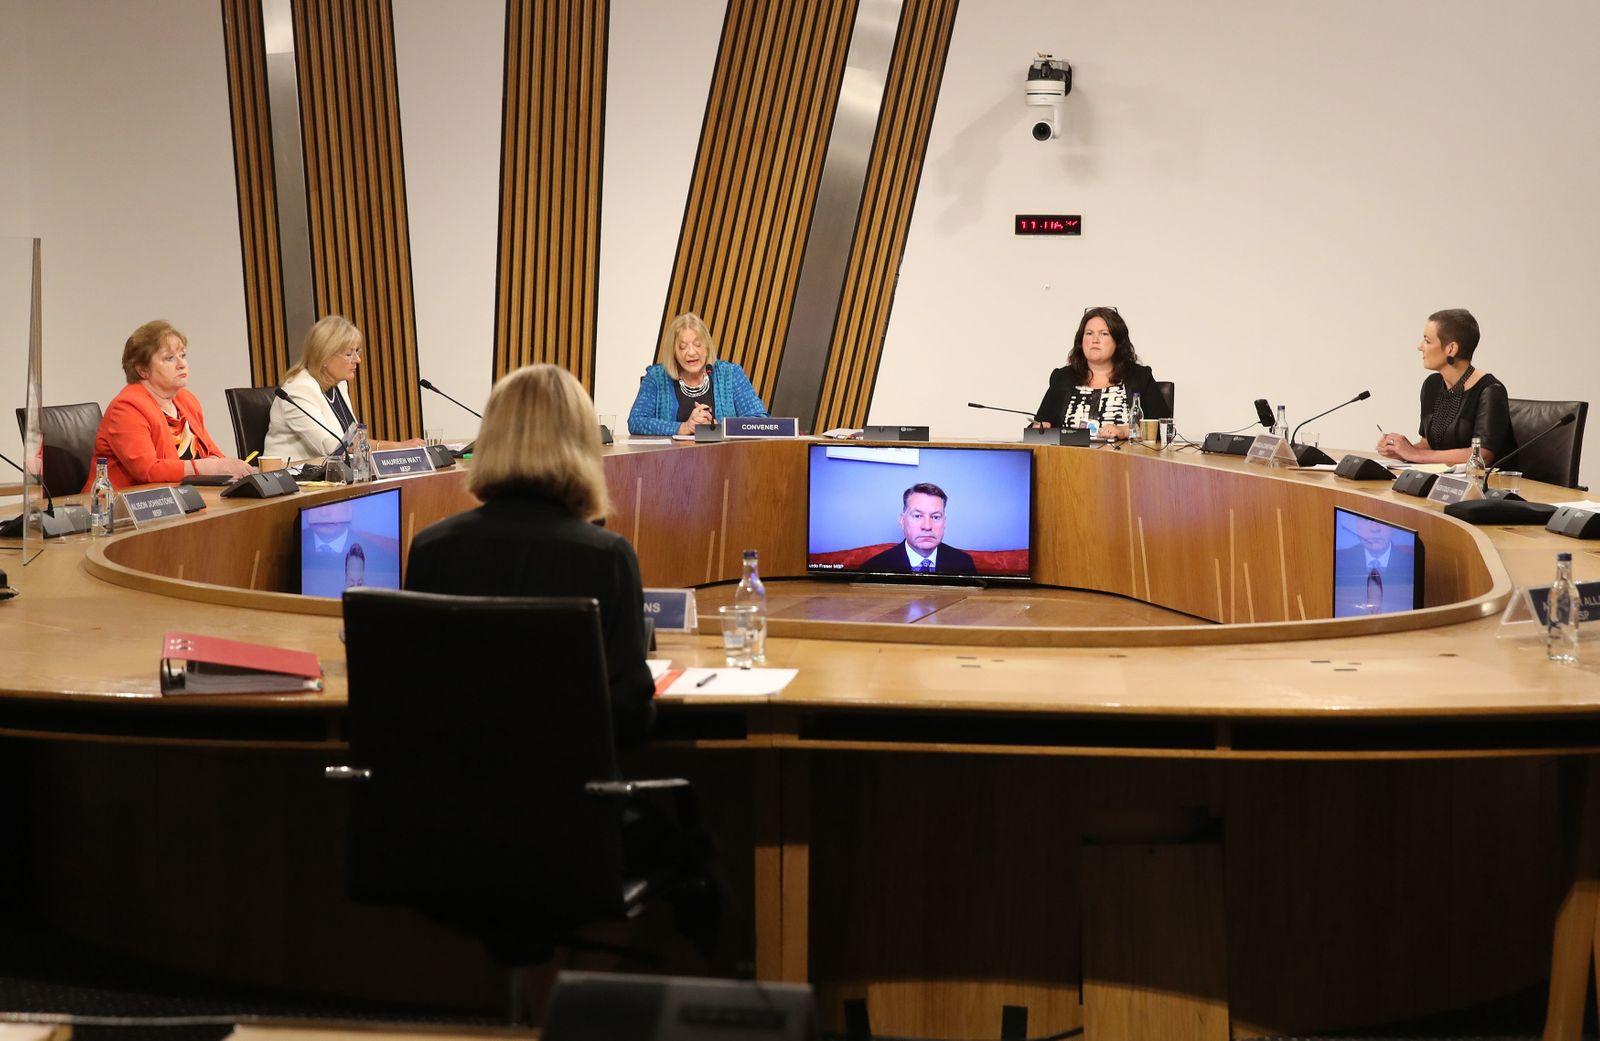 Scotland's Top Civil Servant Gives Evidence To The Alex Salmond Probe Inquiry